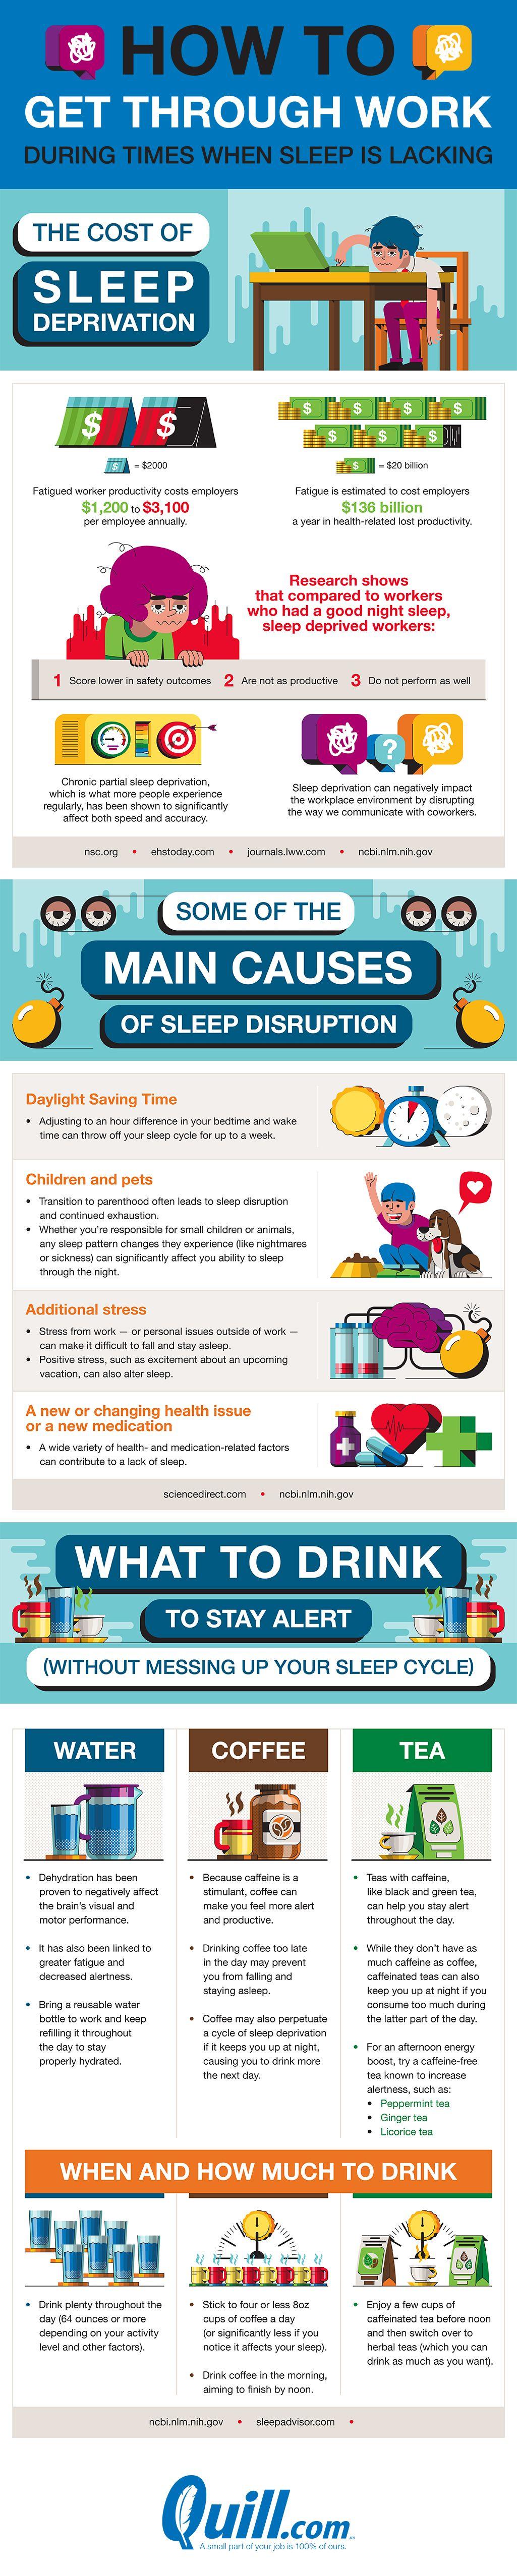 National sleep awareness week sheds light on sleep